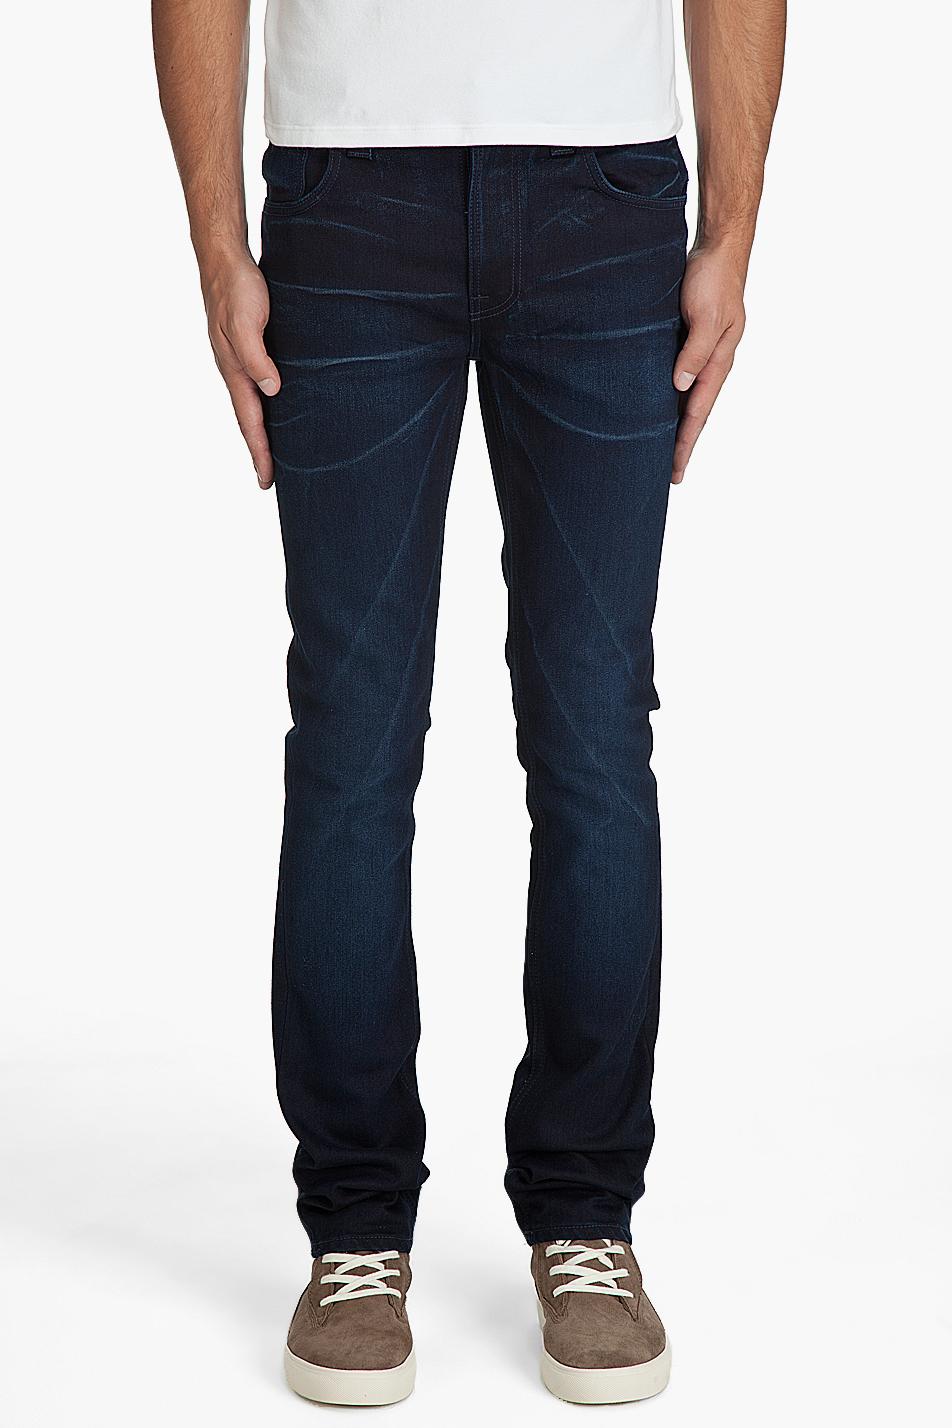 nudie jeans thin finn dark shine manzotti wearlab. Black Bedroom Furniture Sets. Home Design Ideas